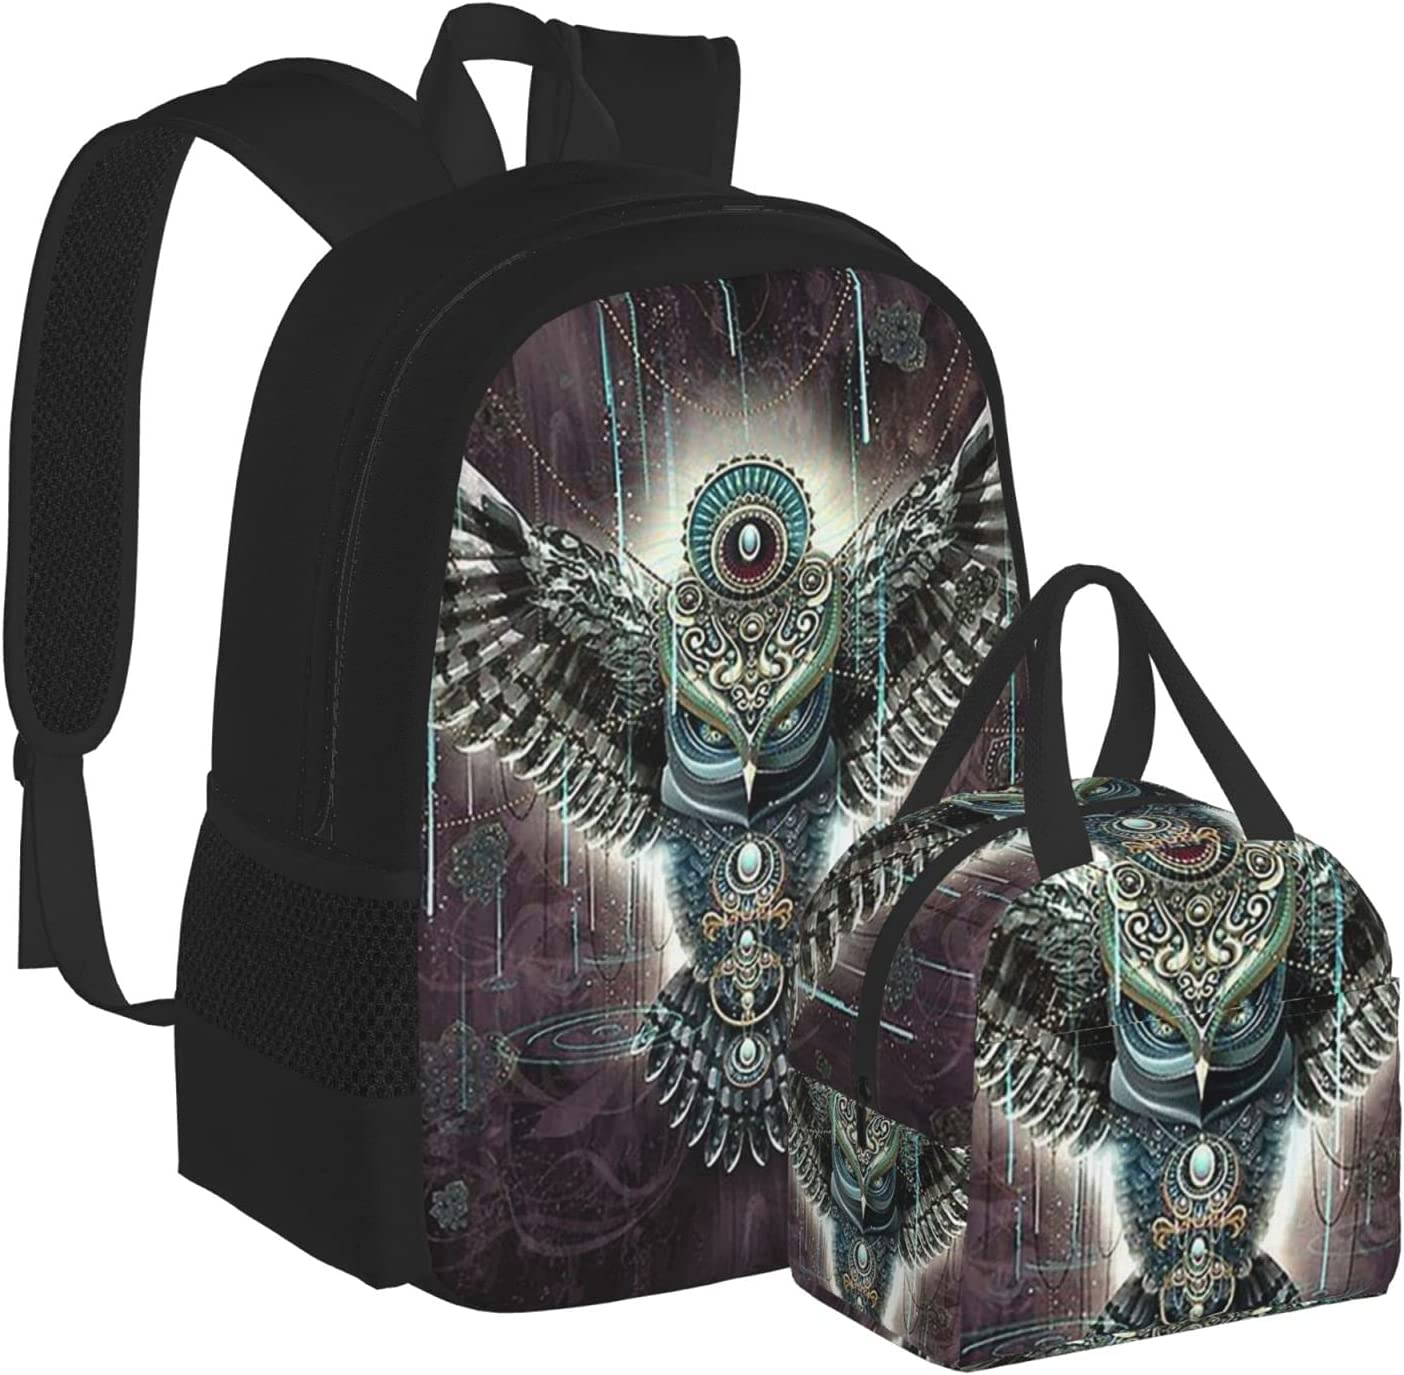 Visionary Inspiration Vintage Owl Max 74% OFF Eagle Spring new work Ba Schoolbag